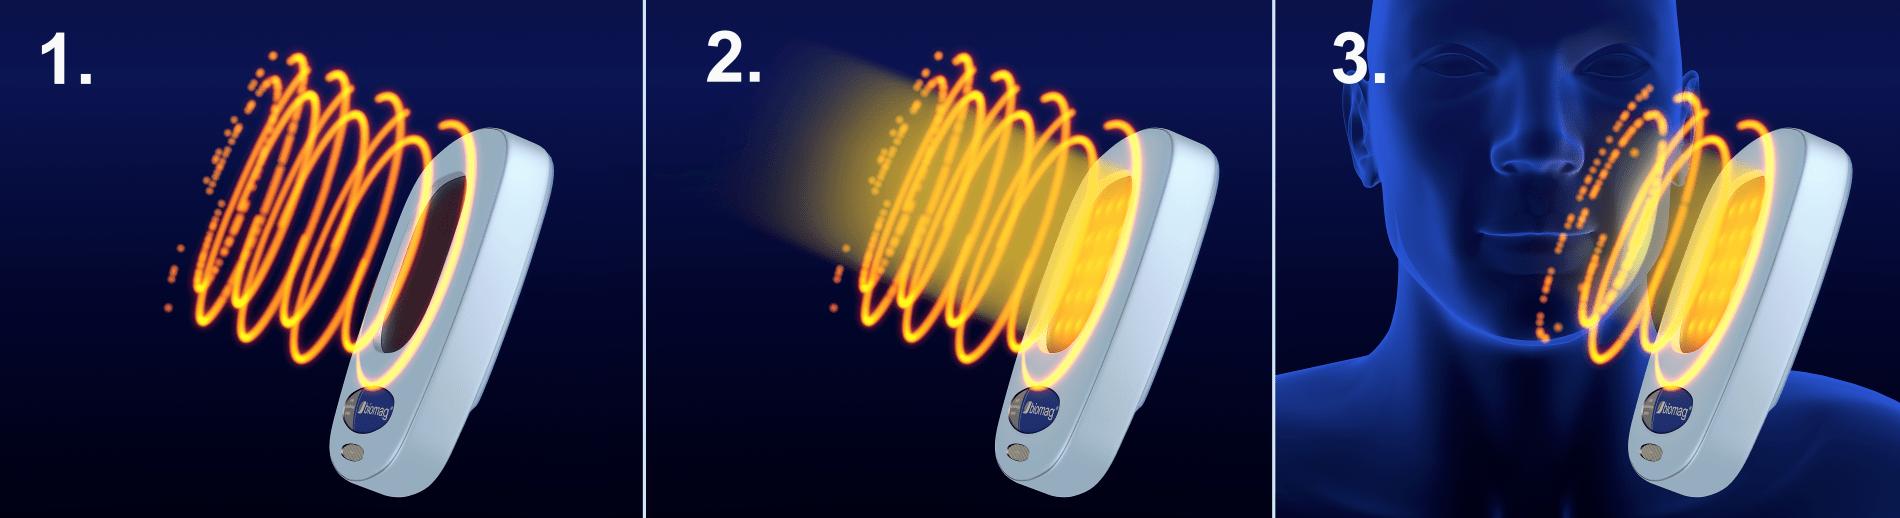 aplikátor magnetoterapie polarizované světlo